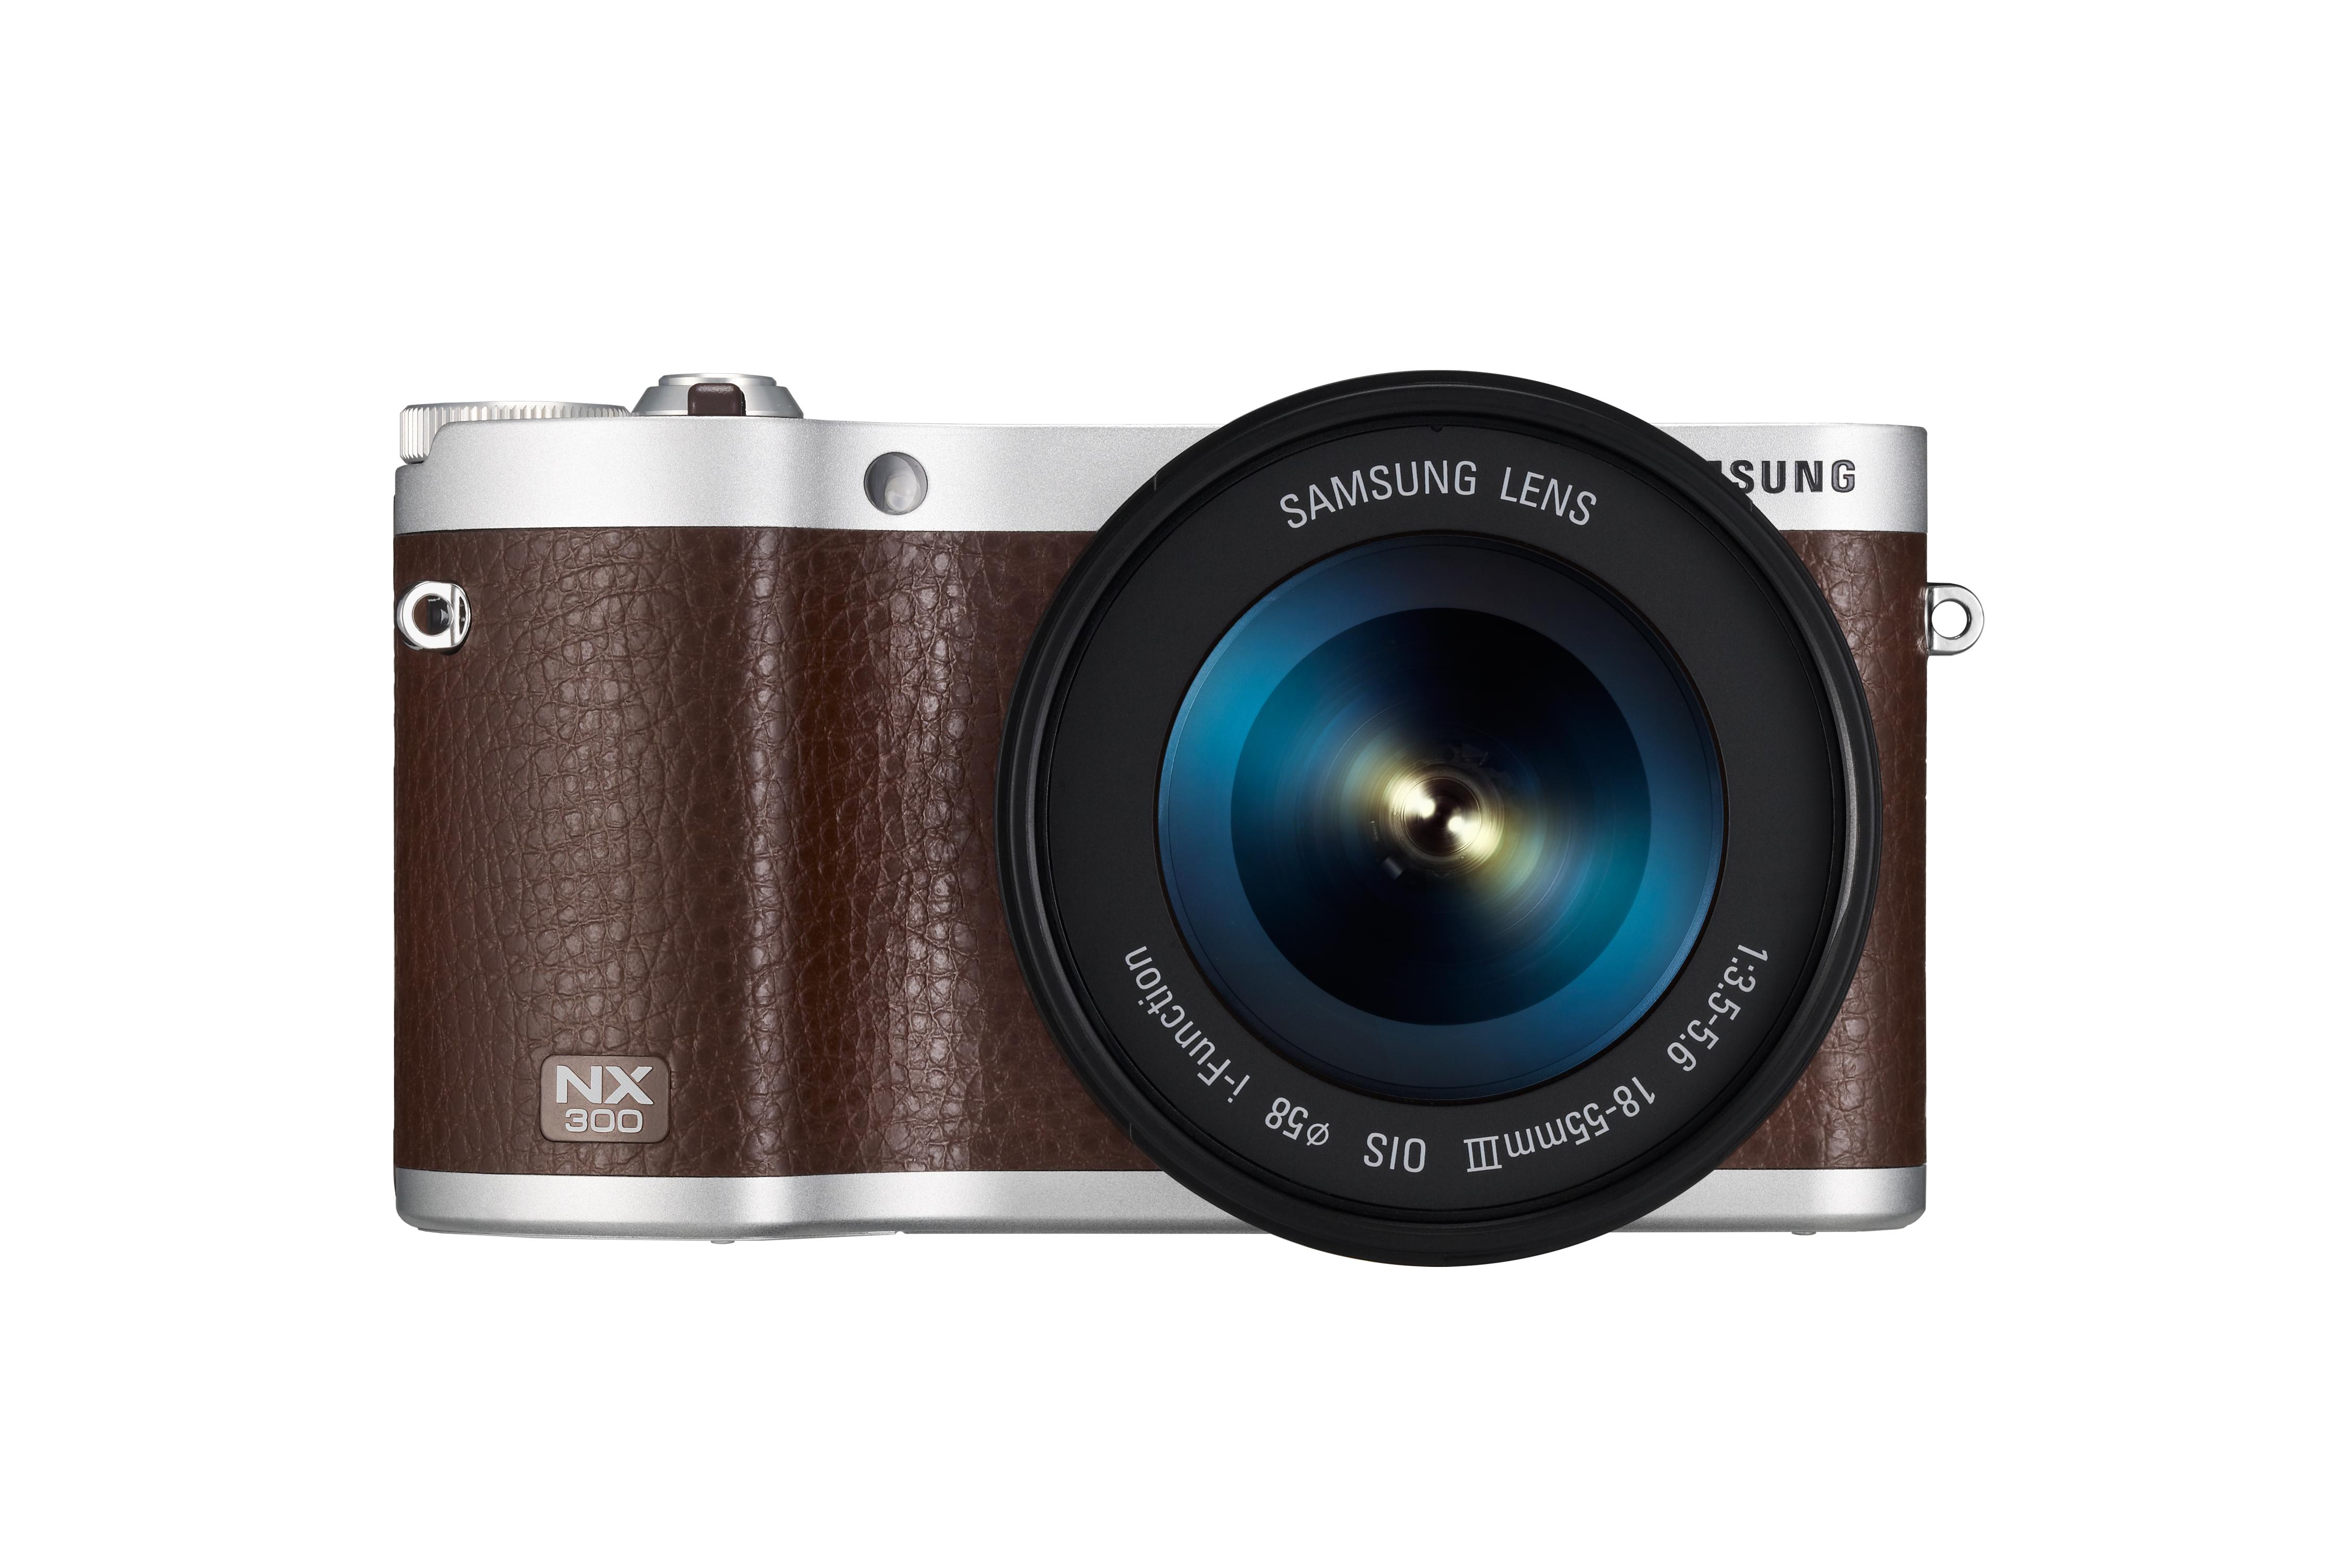 FileSmart Camera NX300